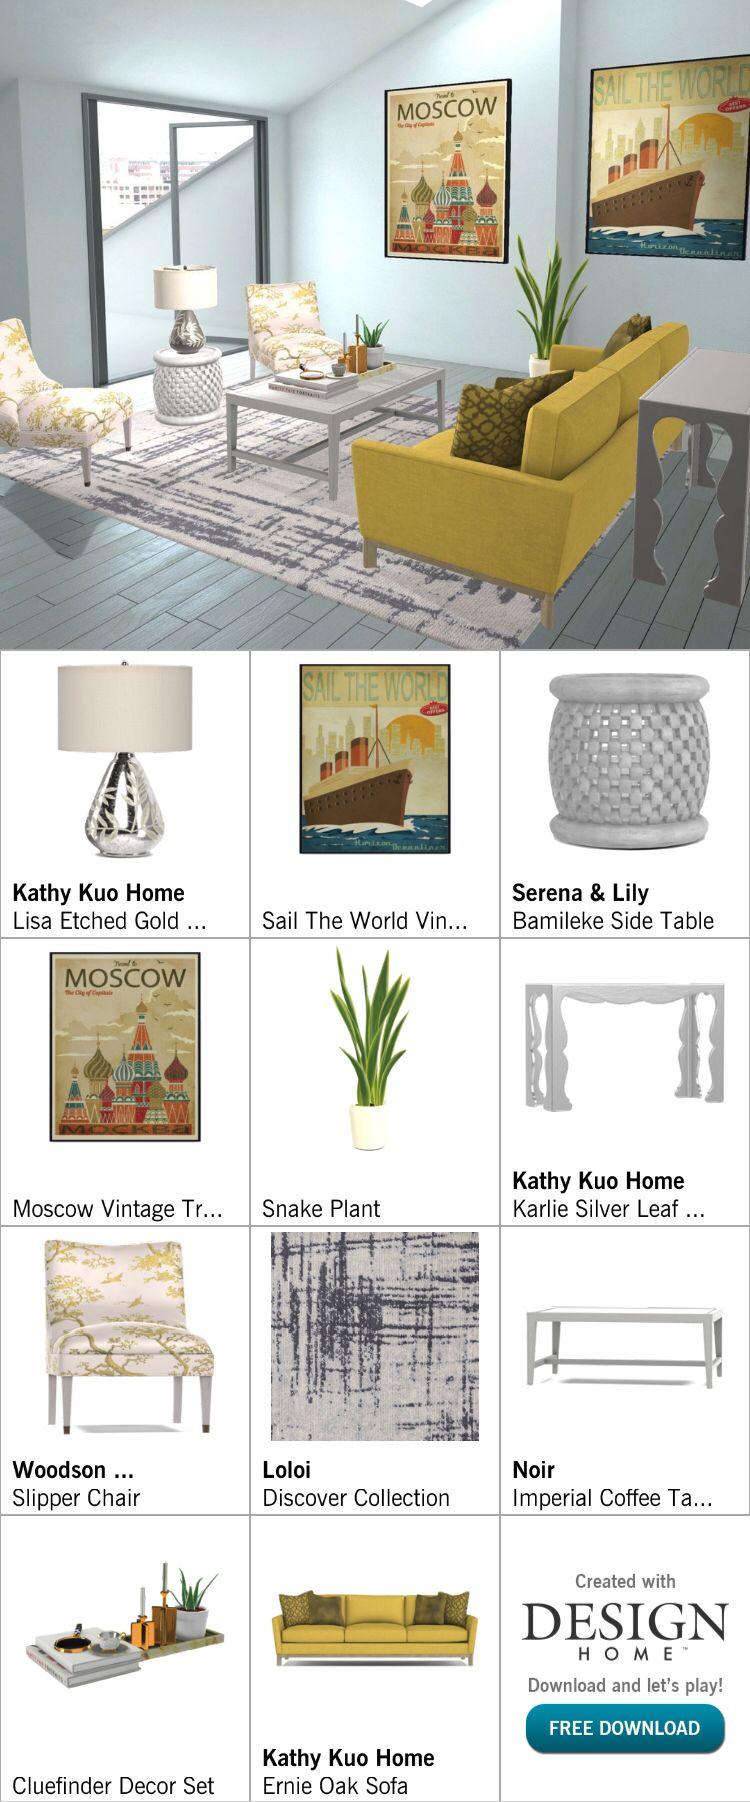 Created with design home also vjosa isein visein on pinterest rh